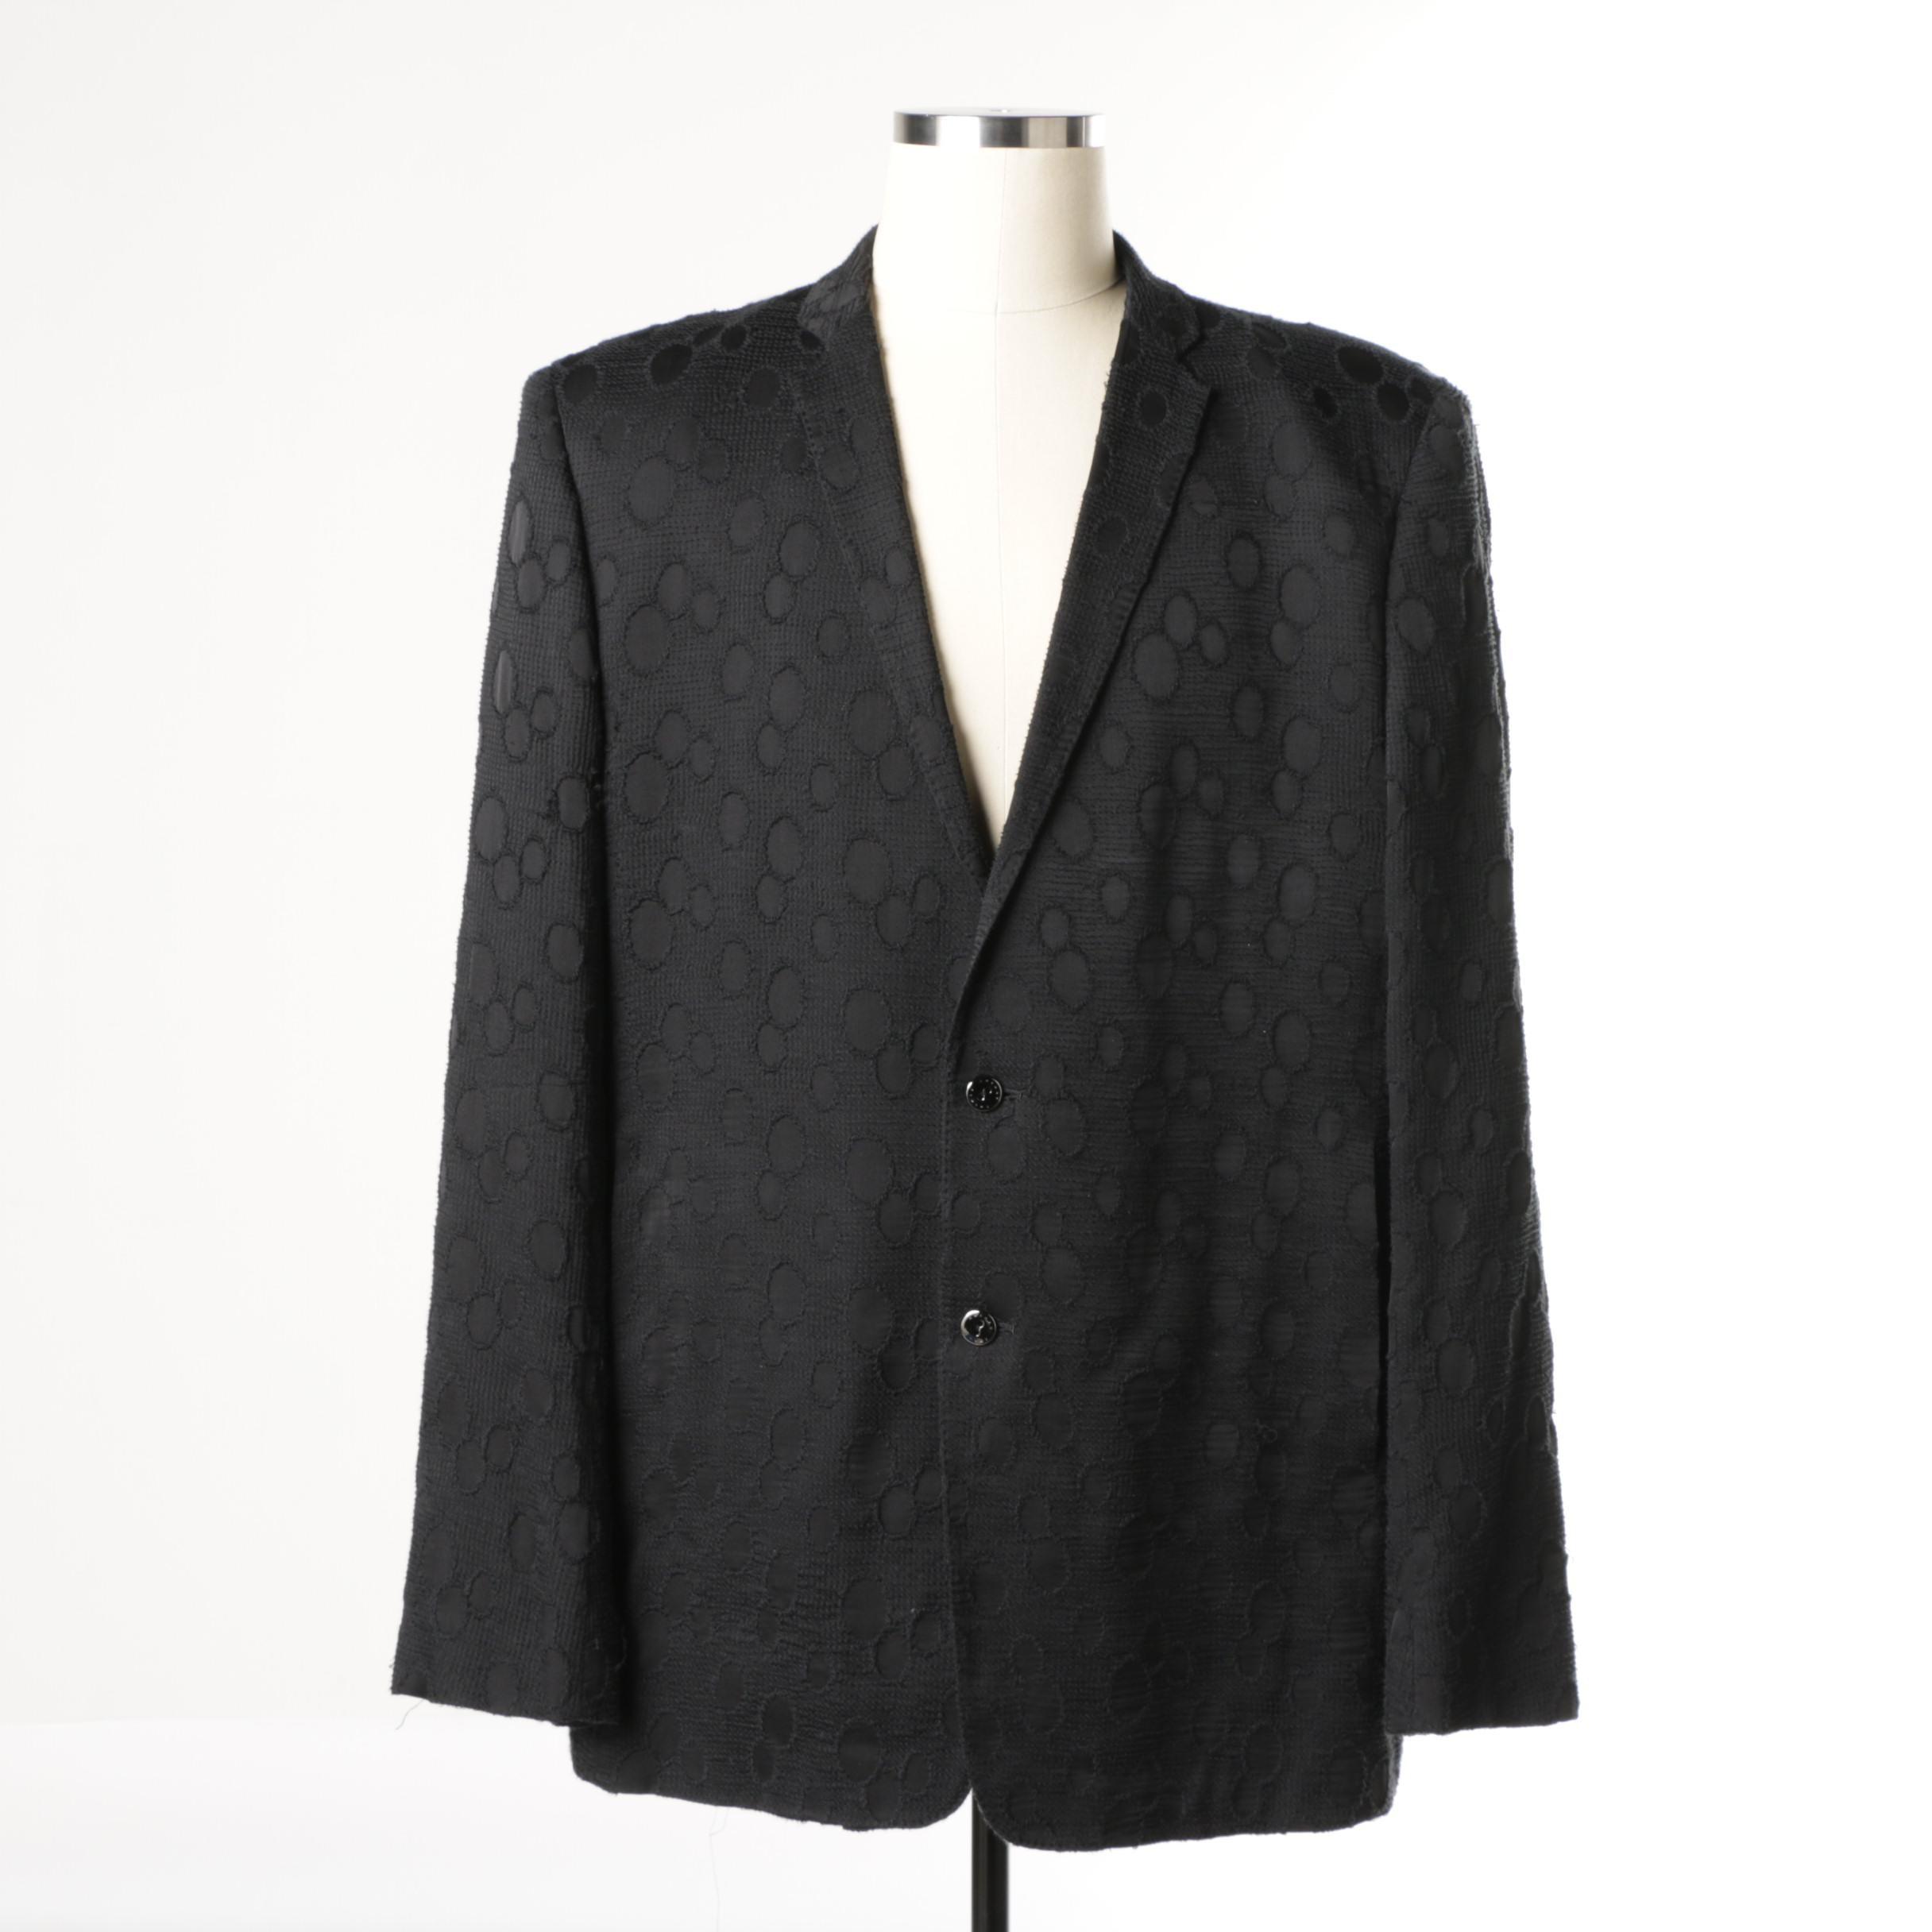 Men's Rynshu Silk Suit Jacket